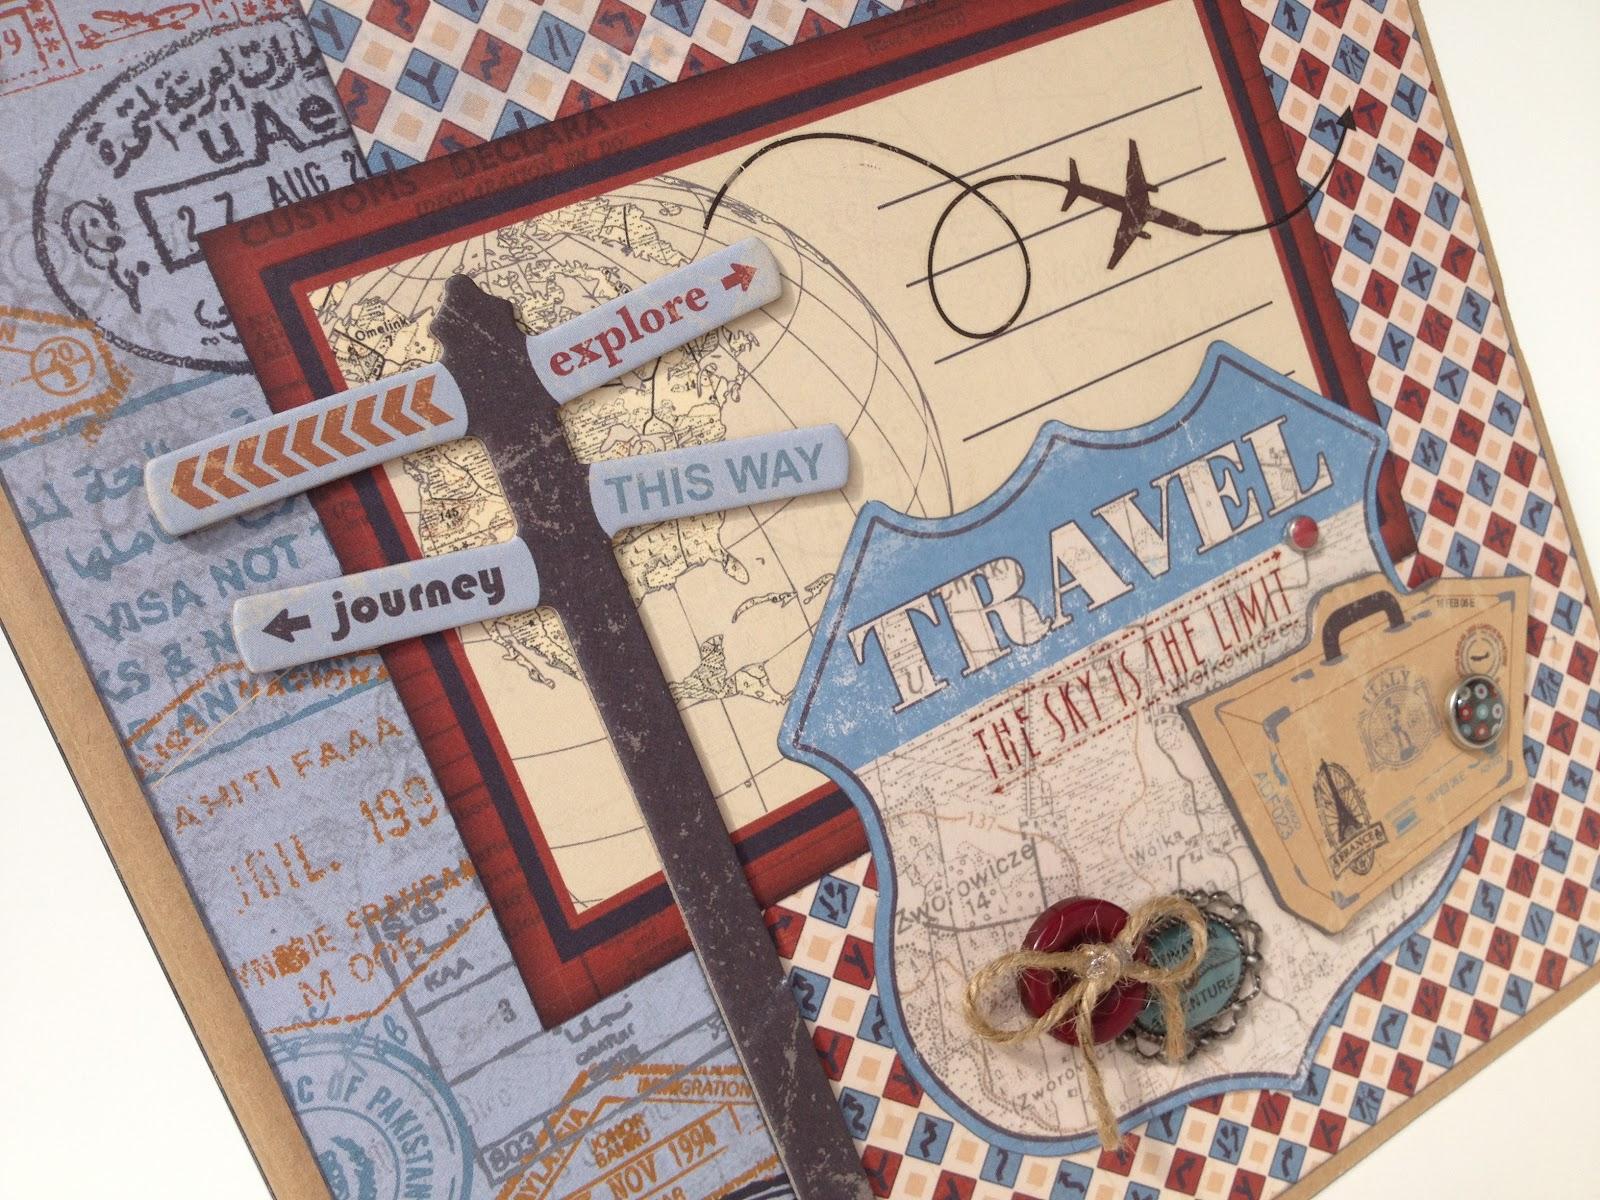 Travel scrapbook ideas - Sunday August 19 2012